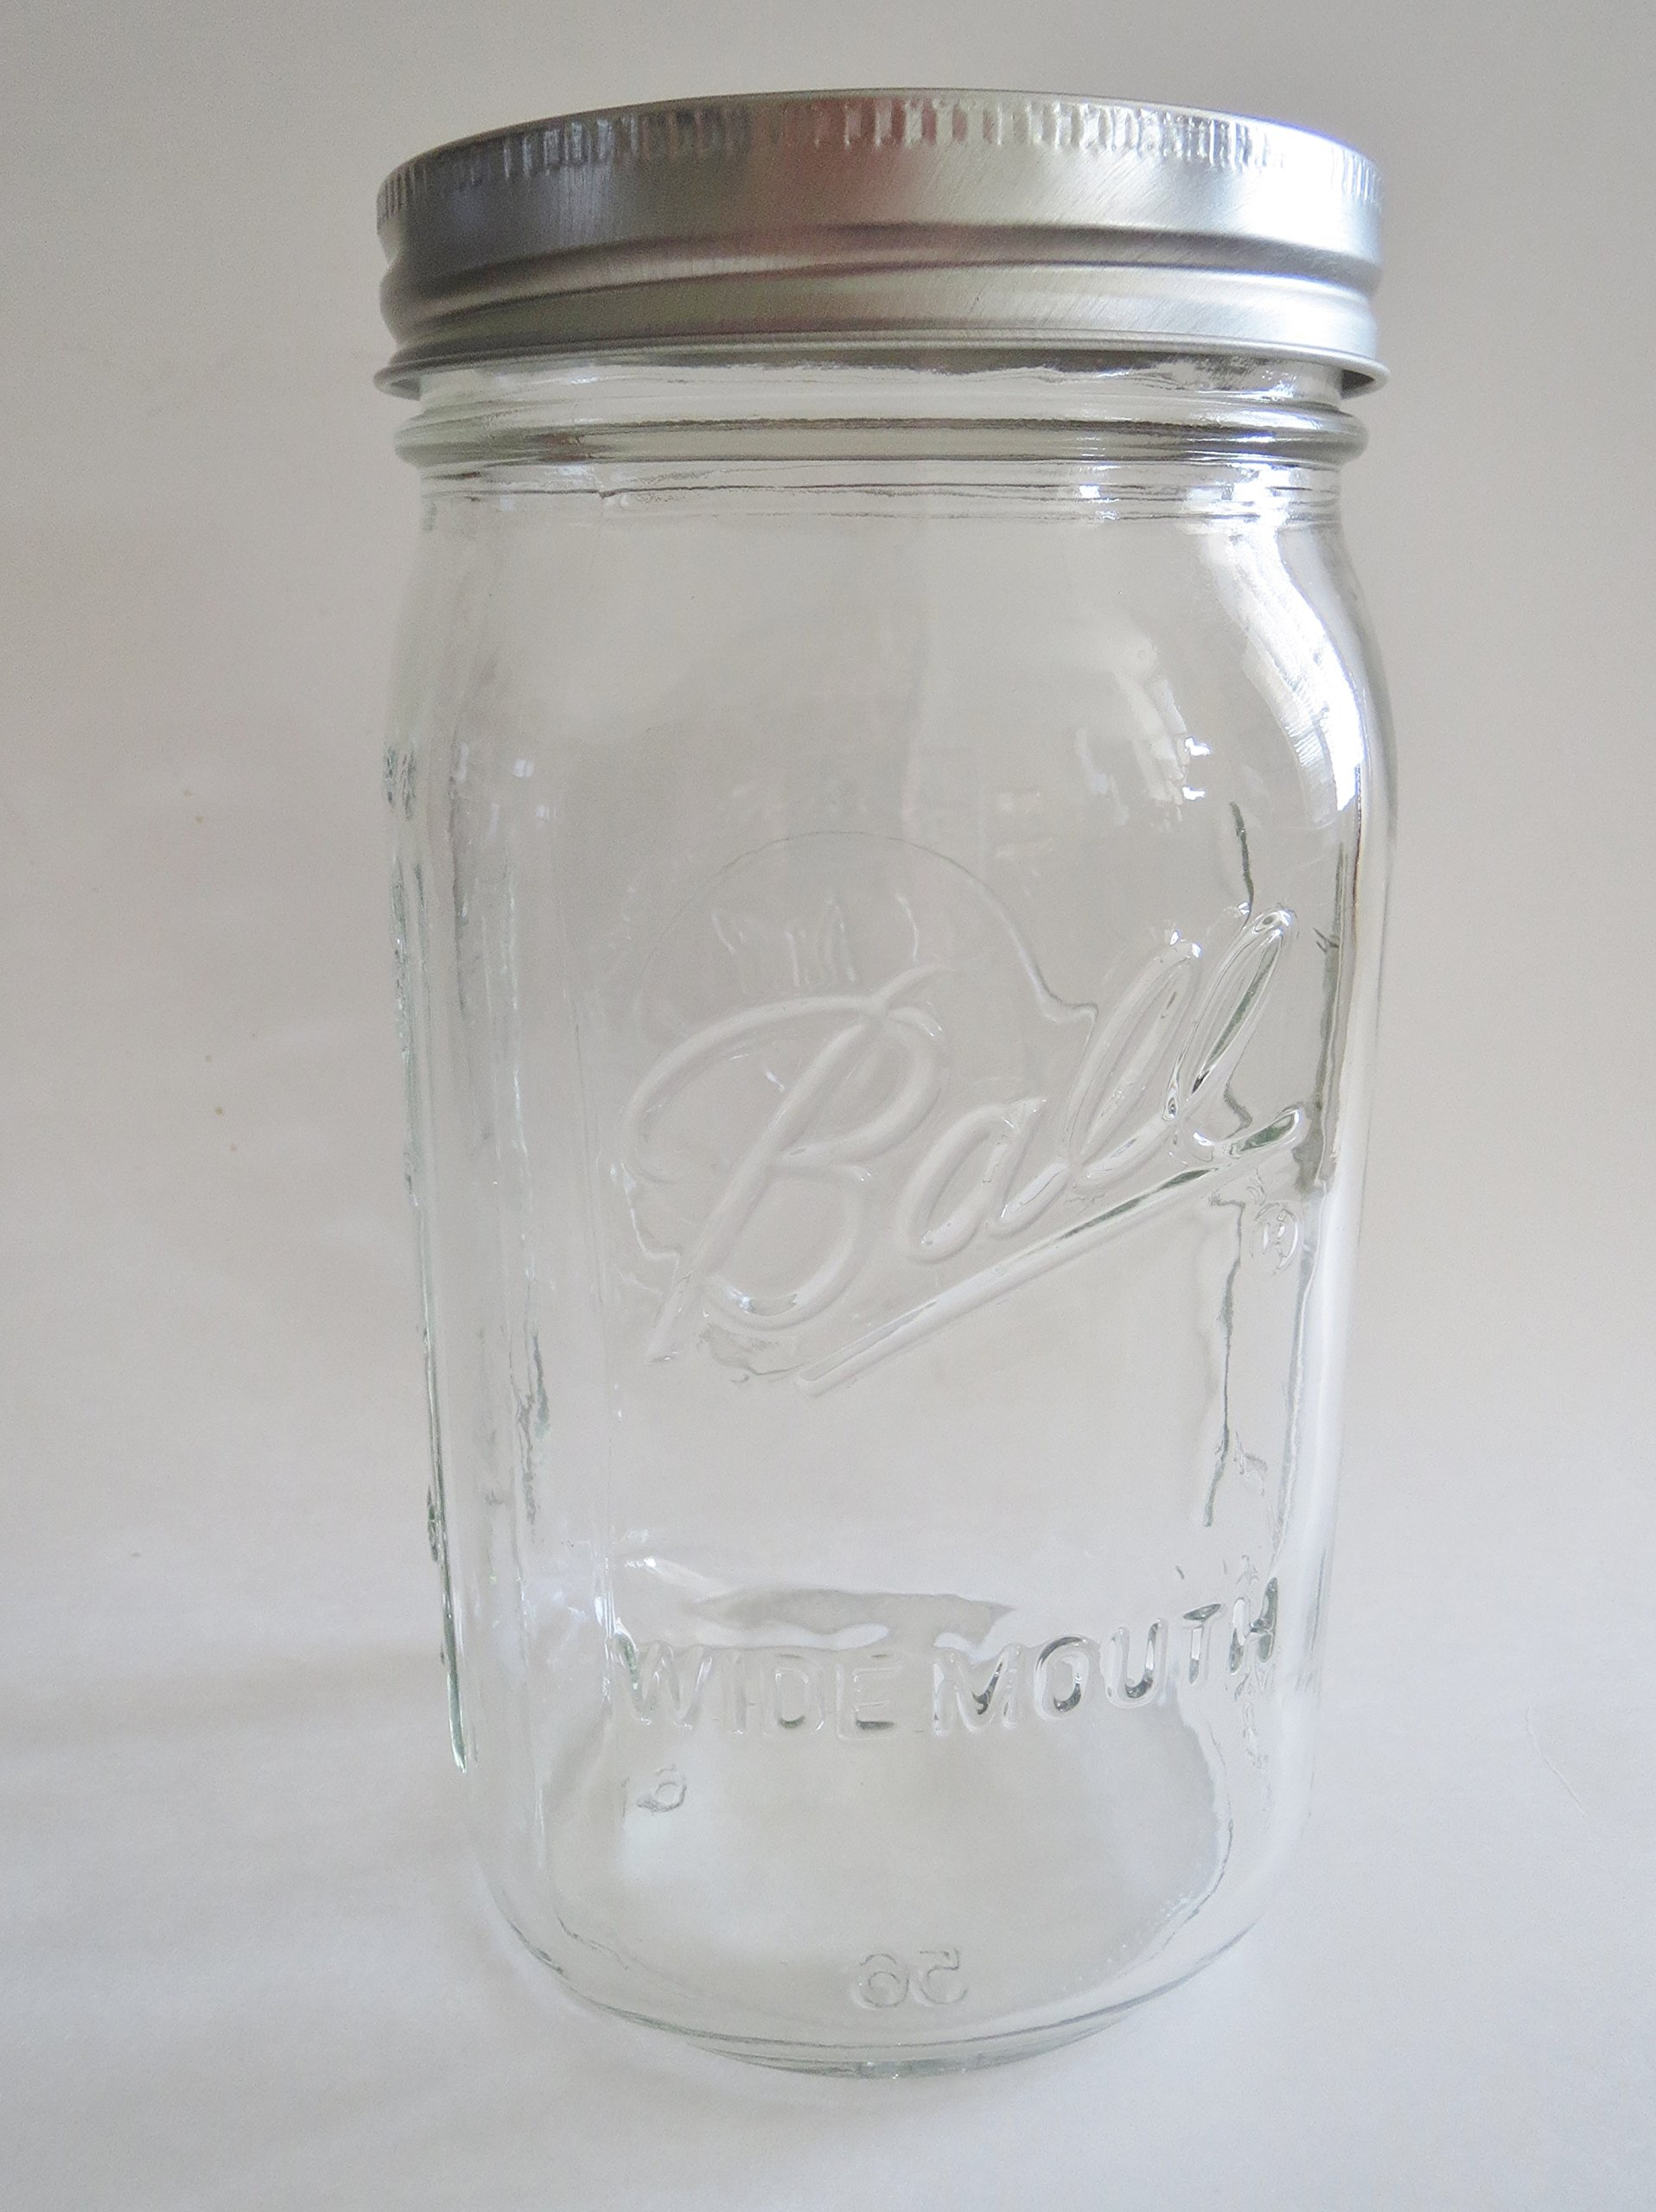 Ball Mason Jar-32 oz. Clear Glass Wide Mouth Ball Collection - One Jar